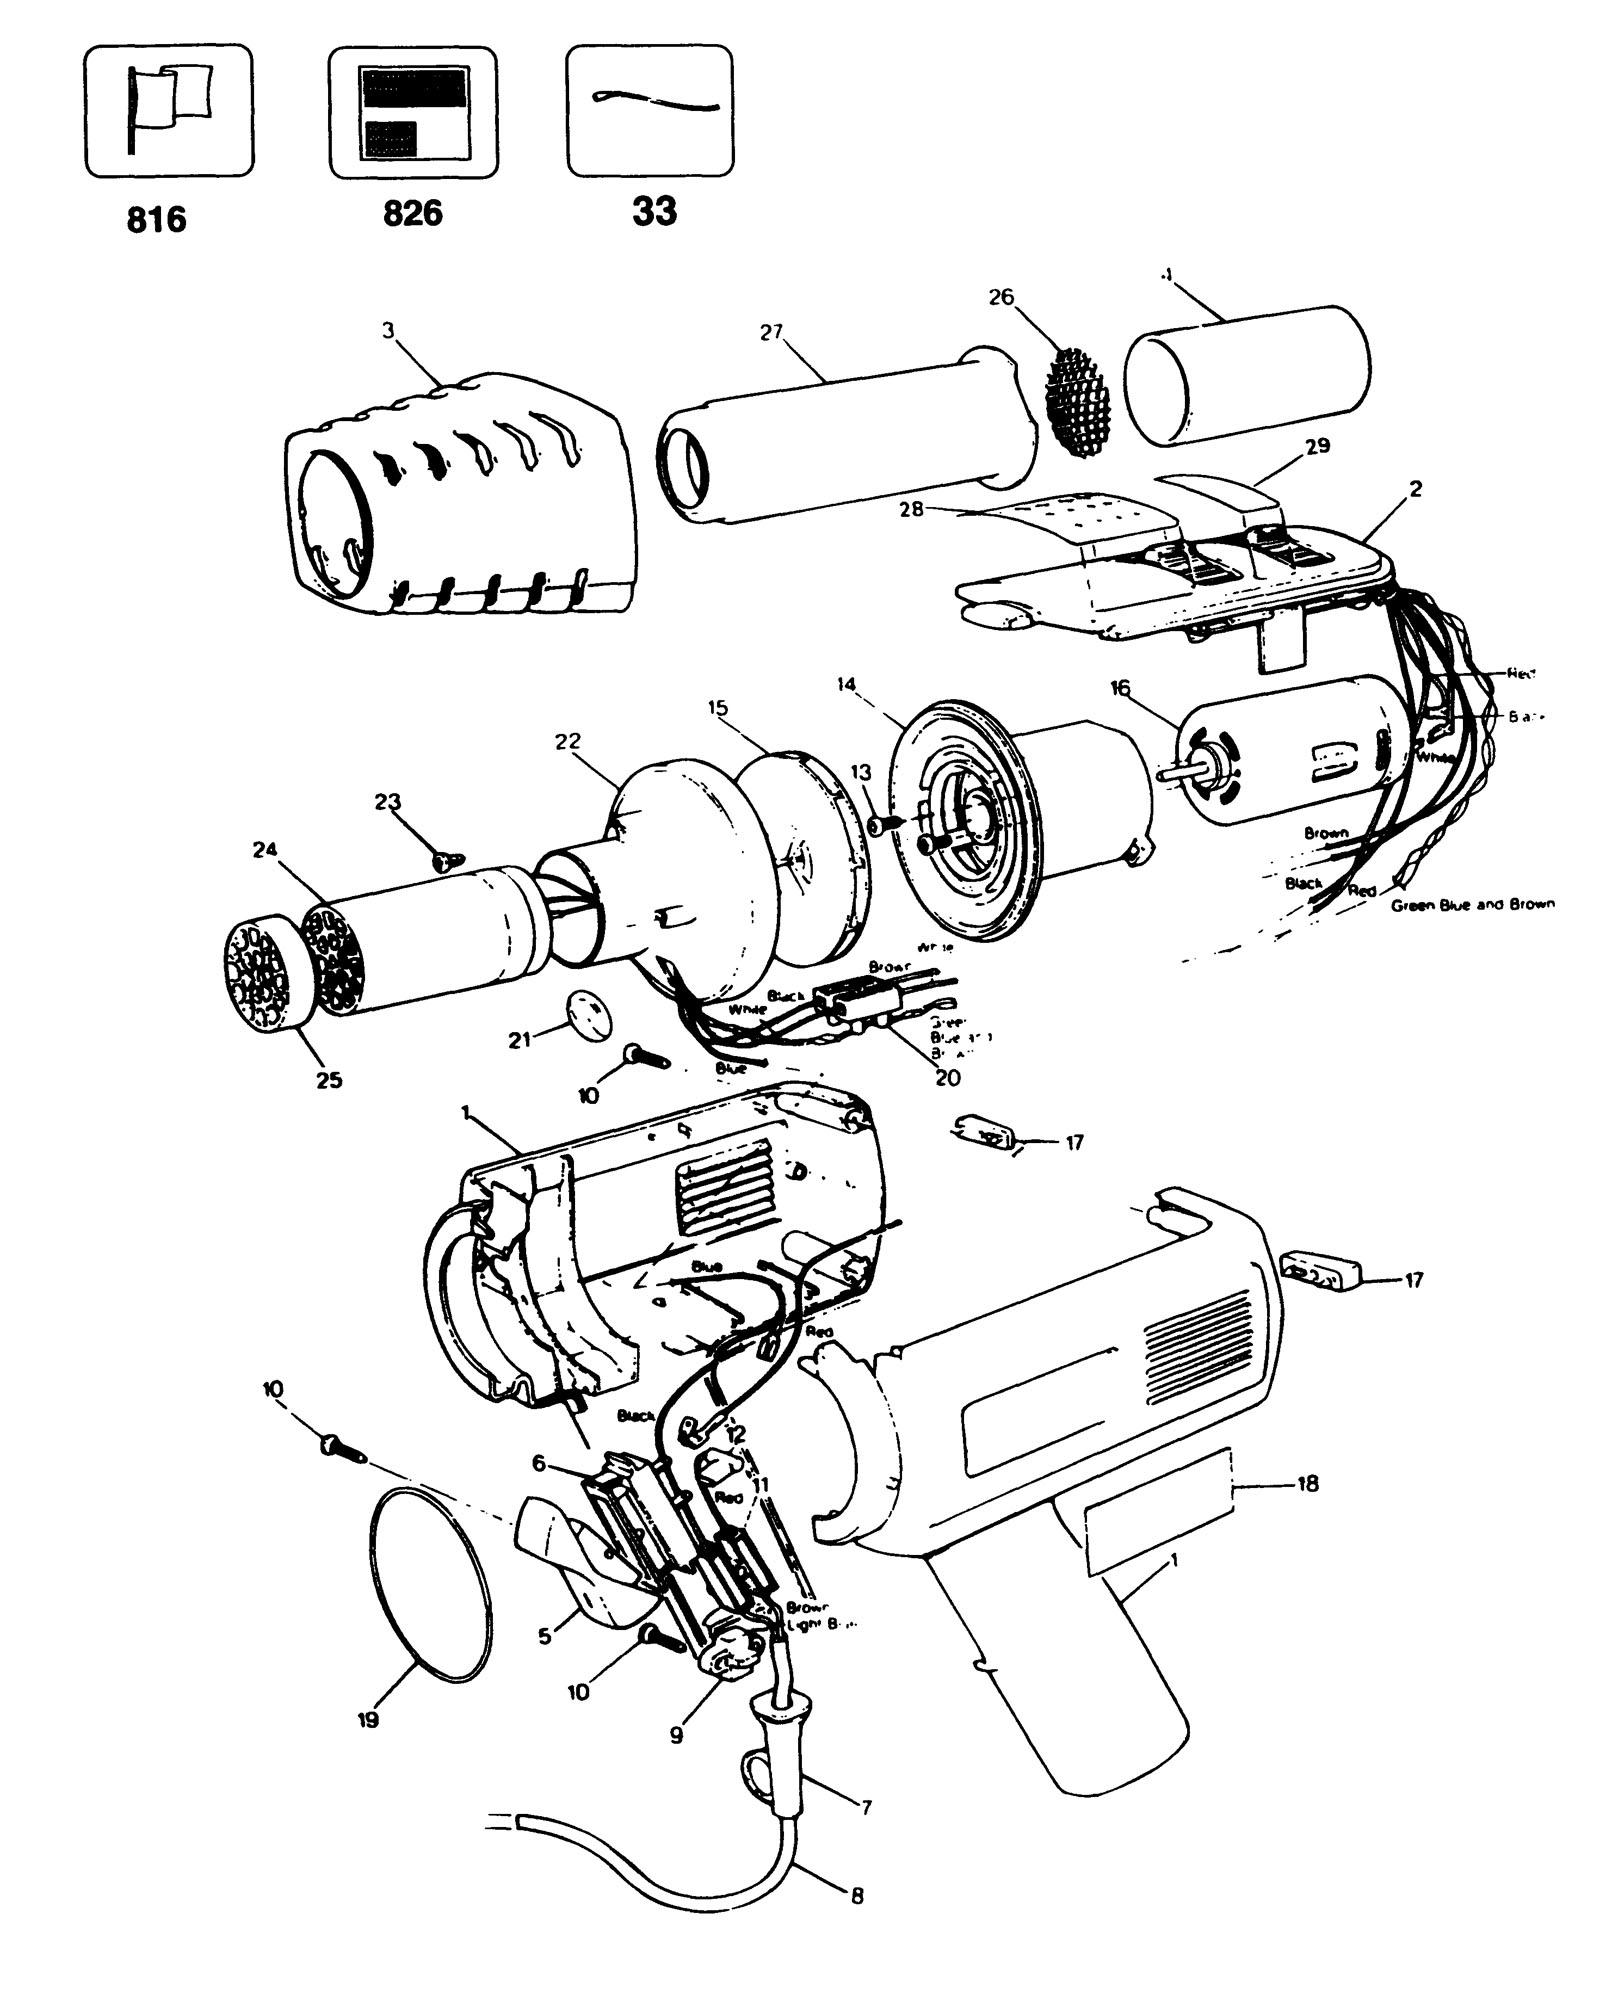 Spares For Black Amp Decker Sr110e Heatgun Type 1 Spare